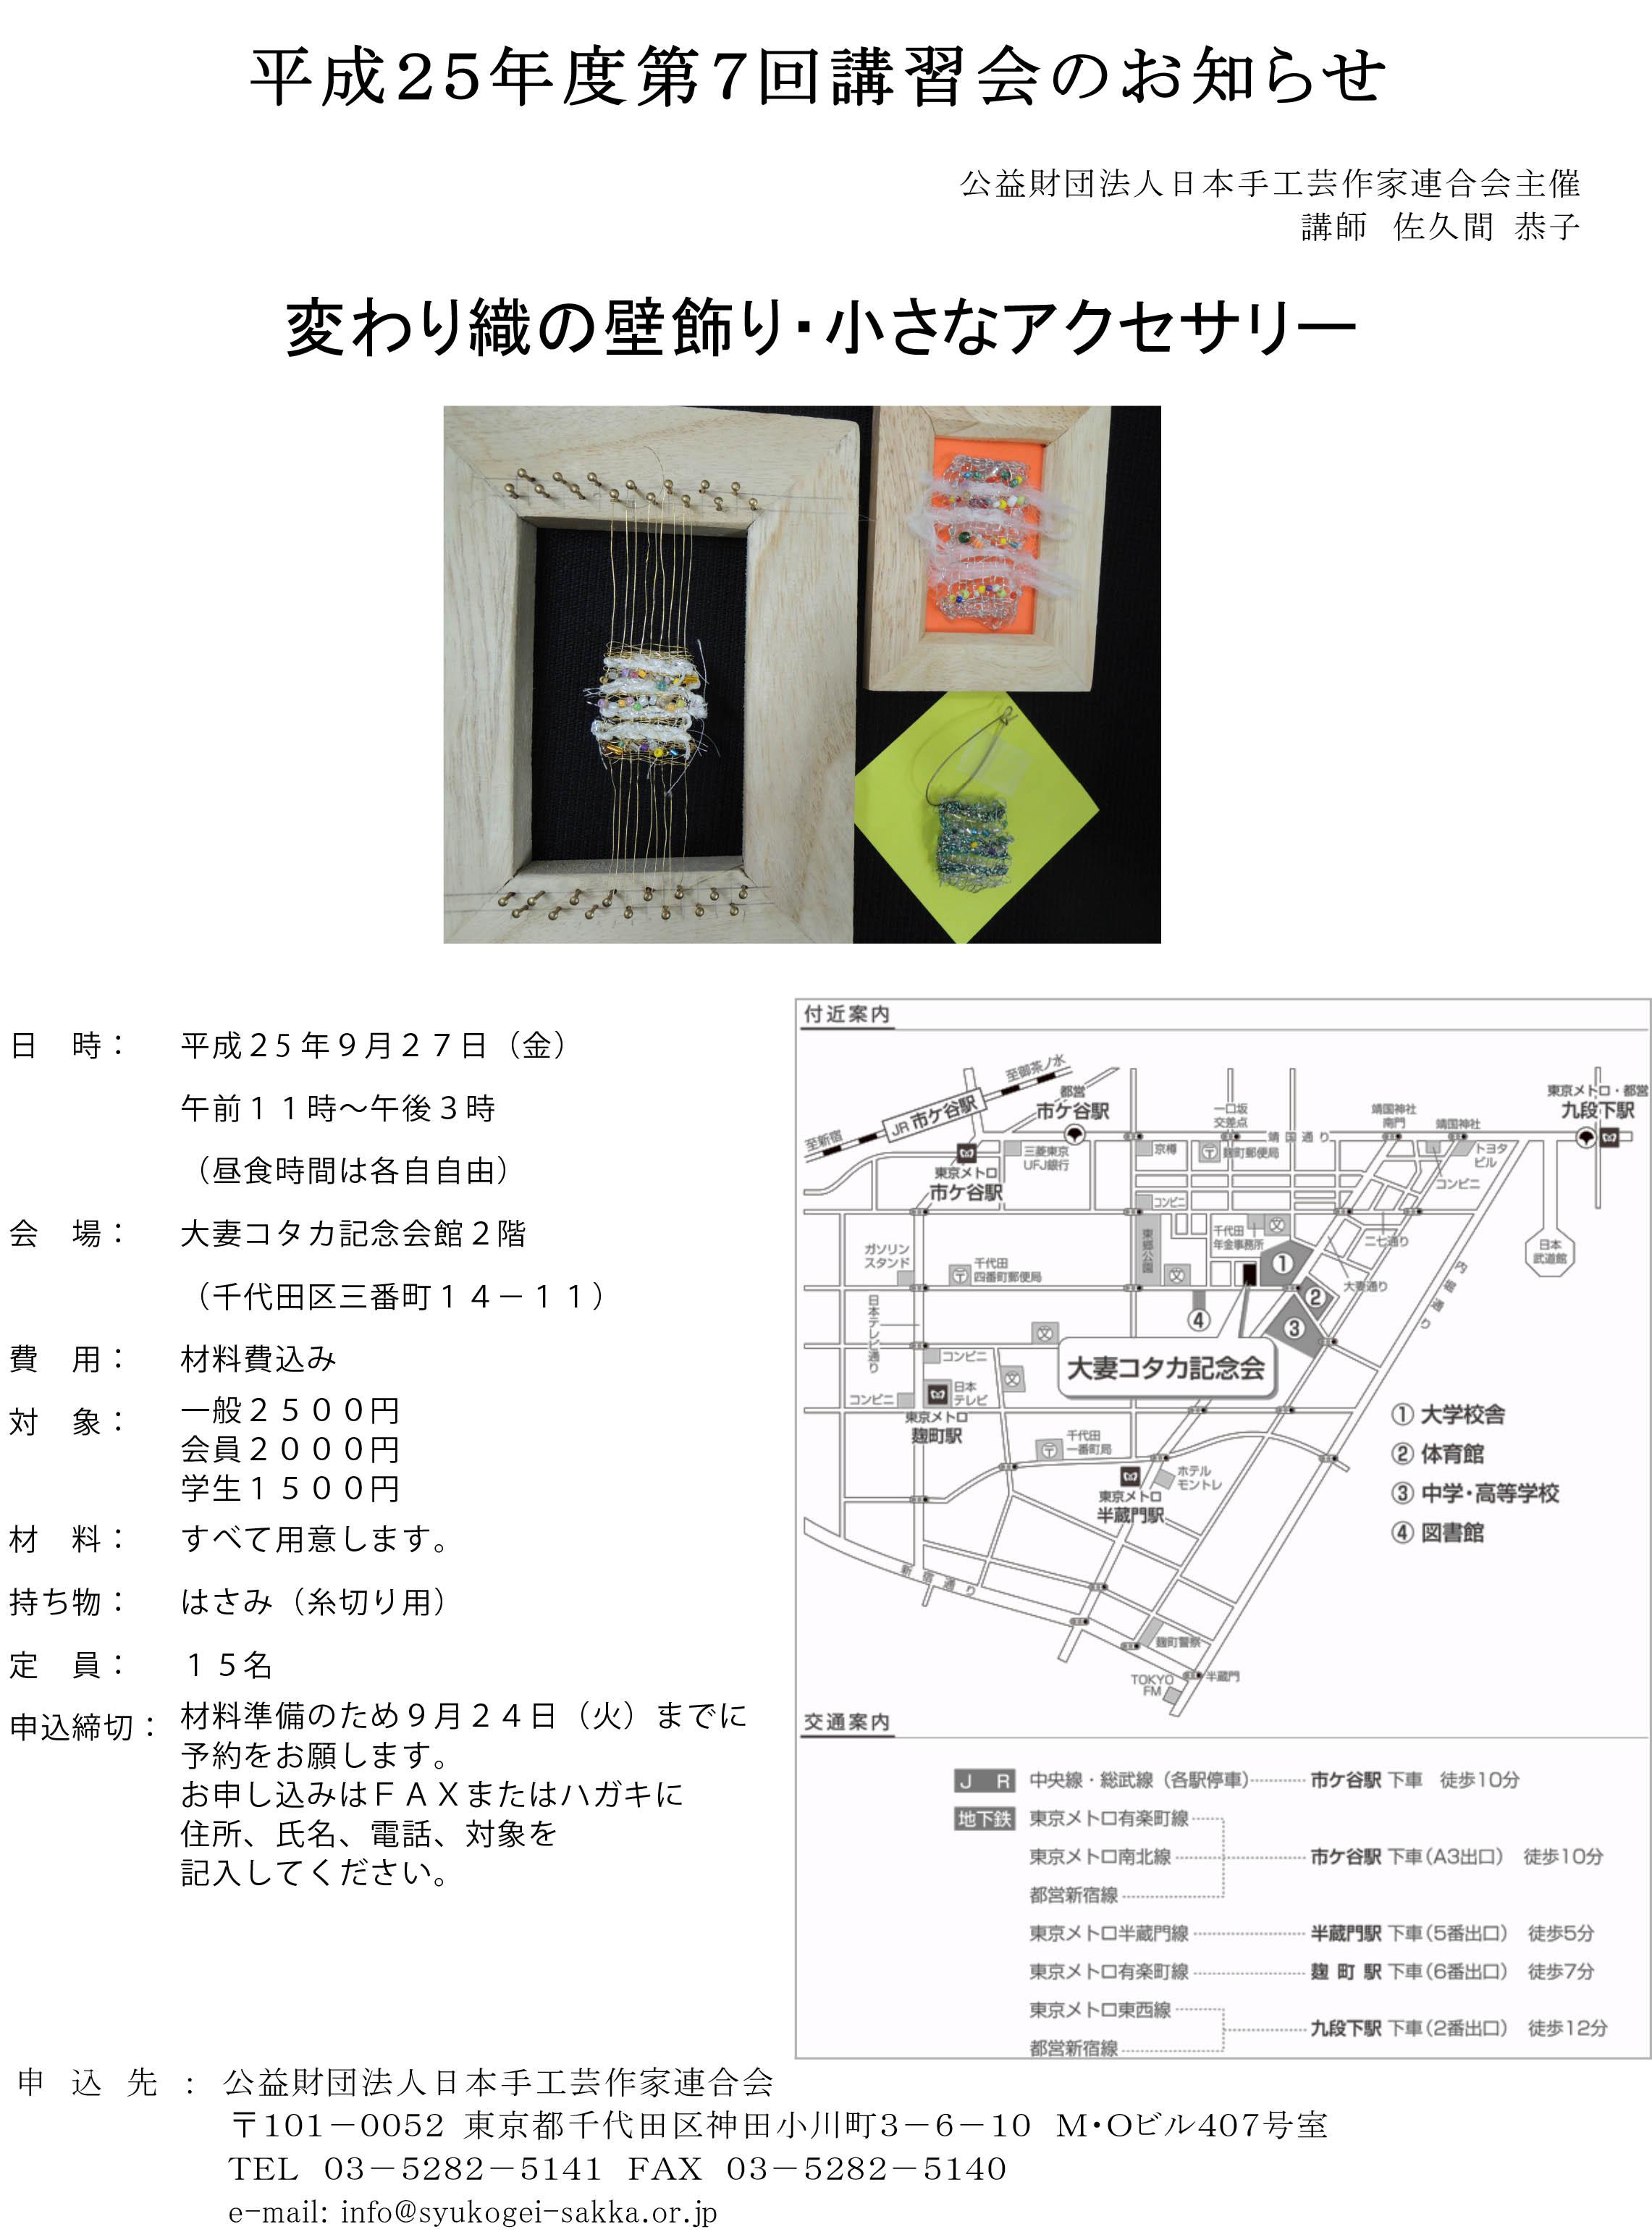 Microsoft Word - 25年第7回変わり織の壁飾り.docx